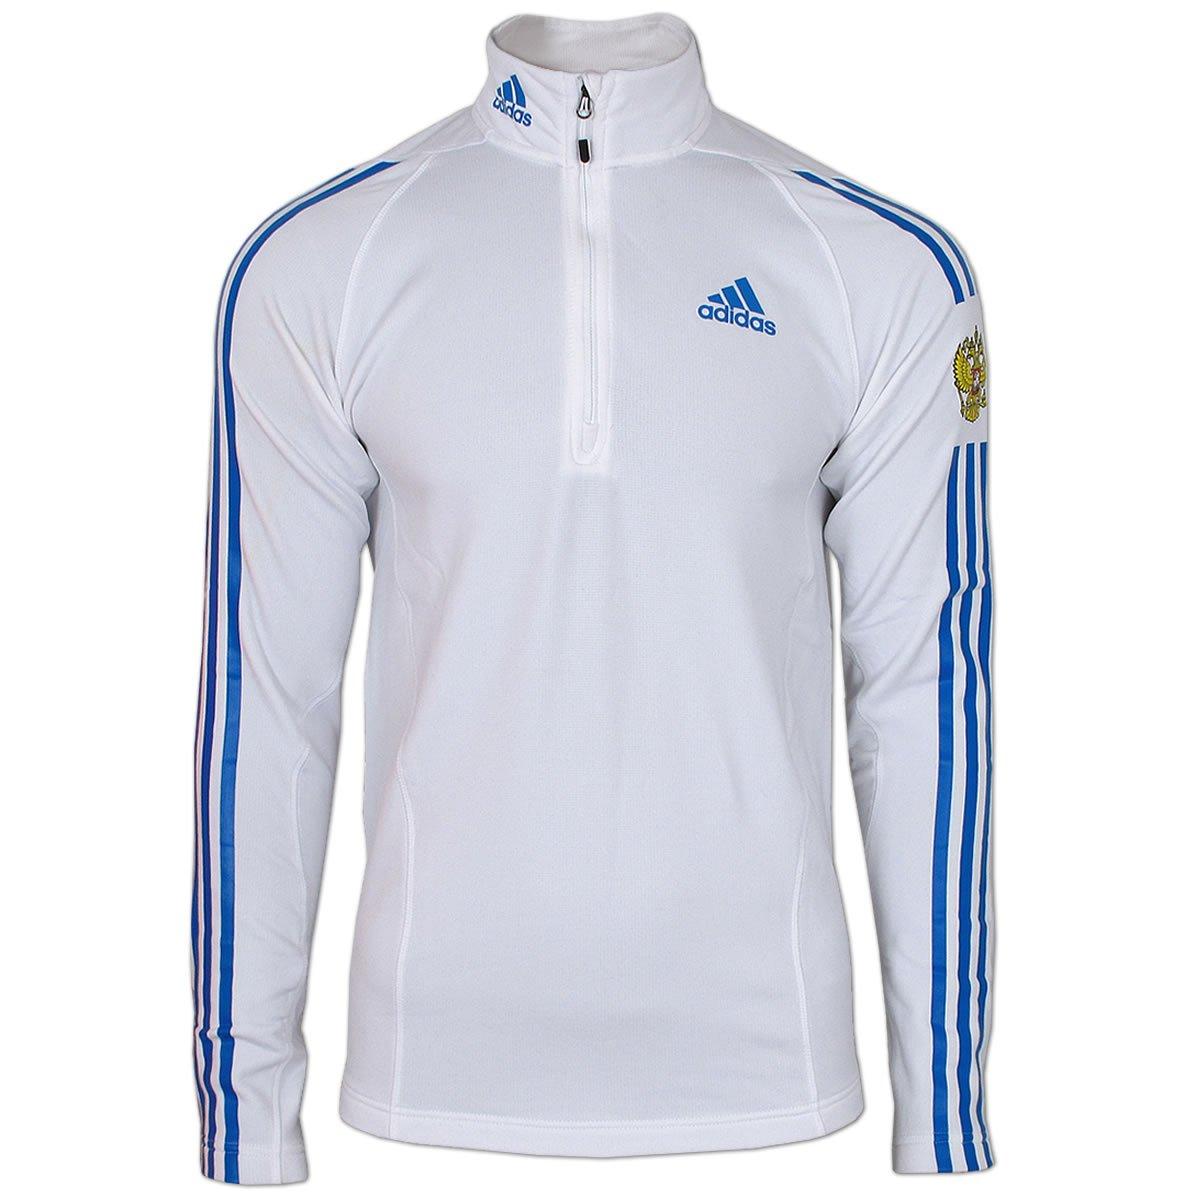 adidas Damen Athleten Jacke Gore Windstopper Team Russia